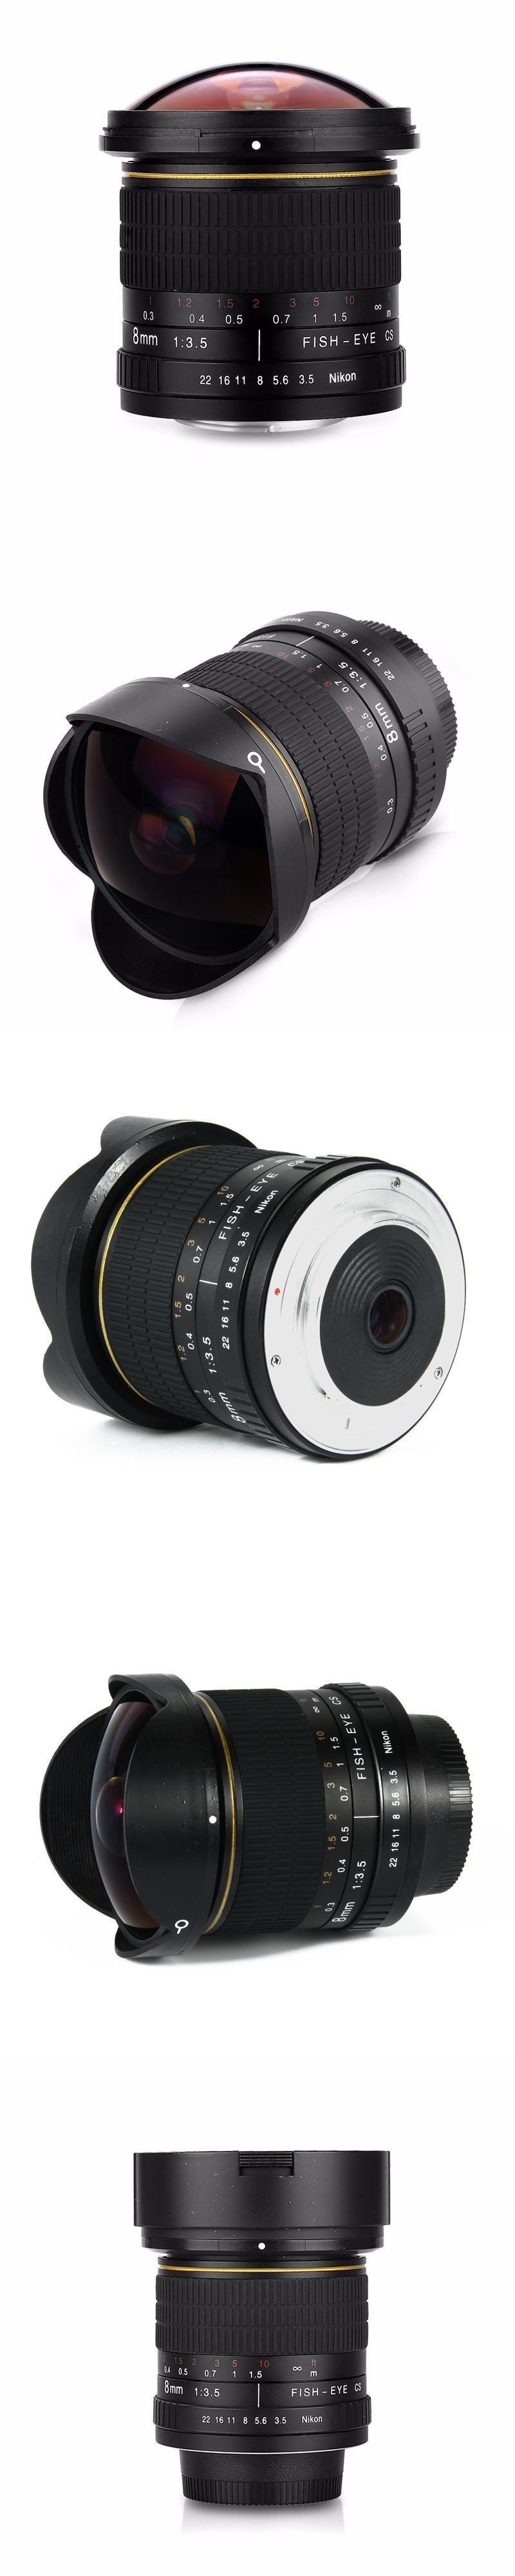 8mm F/3.5 Ultra Wide Angle Fisheye Lens for APS-C/ Full Frame Nikon ...